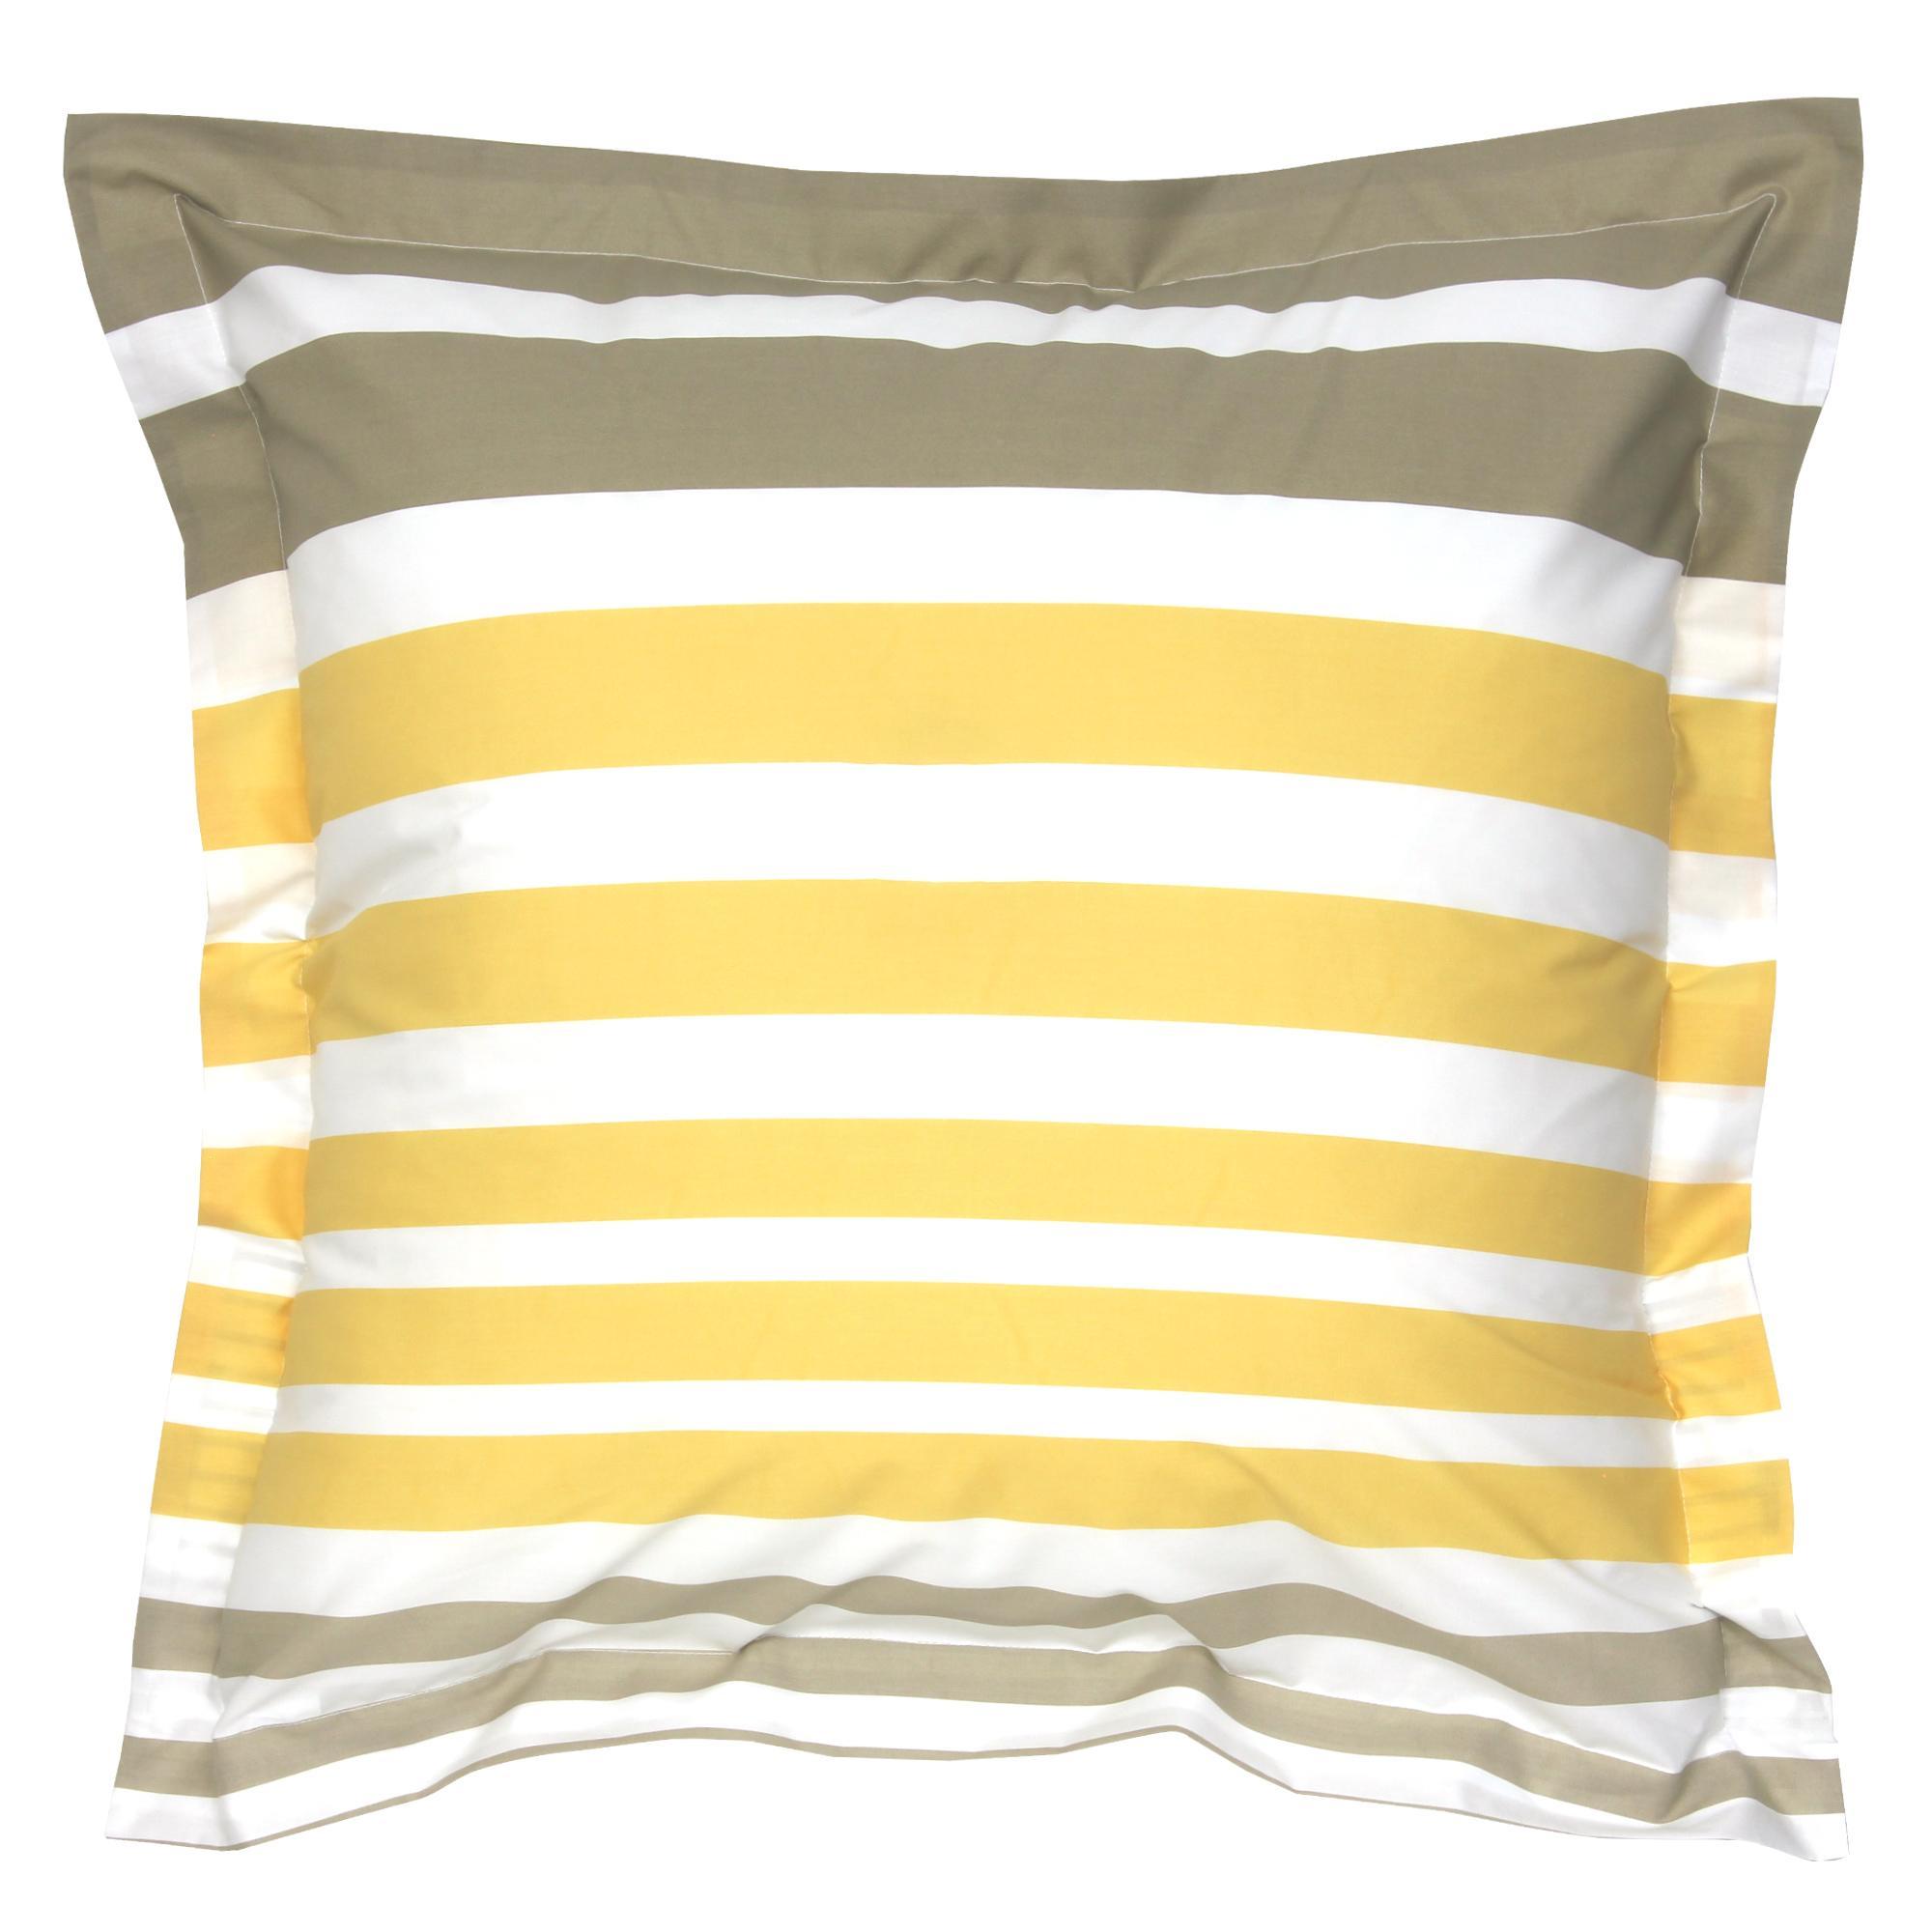 taie d 39 oreiller 65x65 percale pur coton stripe narcisse. Black Bedroom Furniture Sets. Home Design Ideas